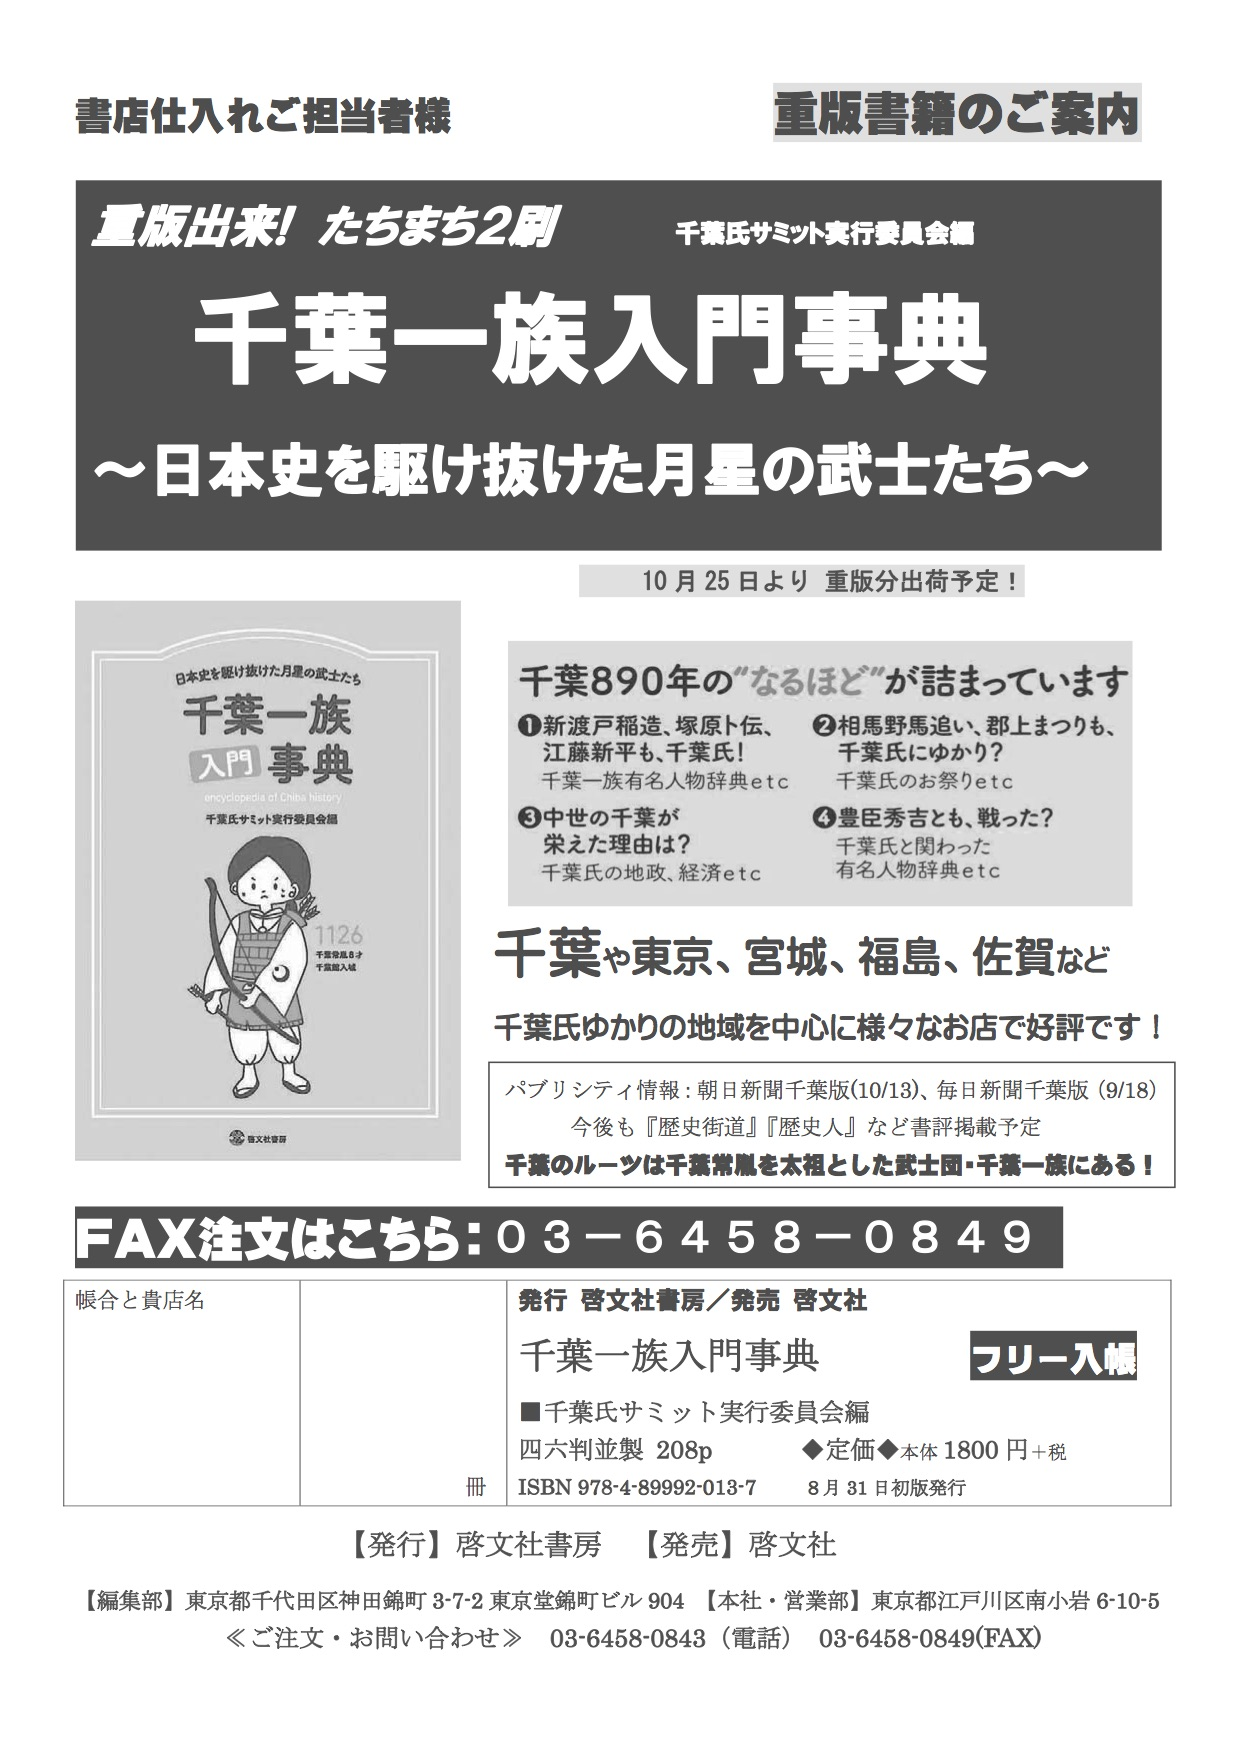 kei-bunsha_1610181138_1